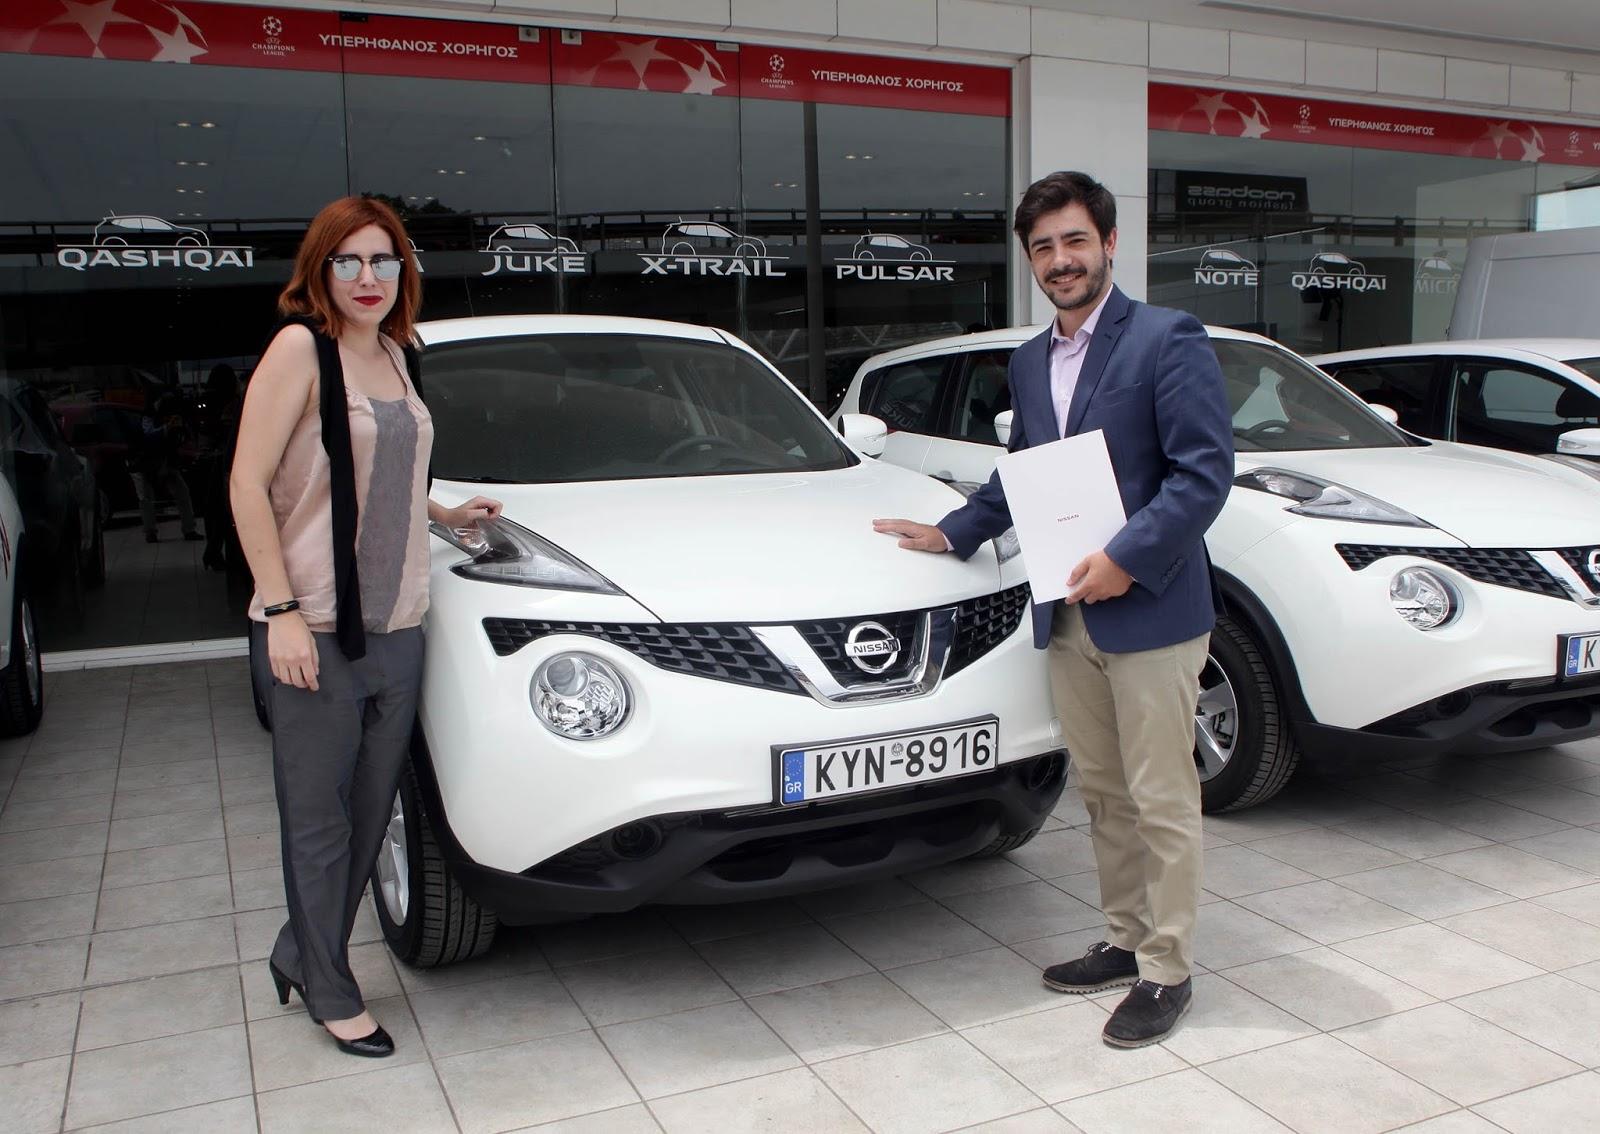 IMG 6127 Η Nissan βραβεύει με αυτοκίνητα του νικητές του GENERATION N ! Events, Future, Innovation, Nissan